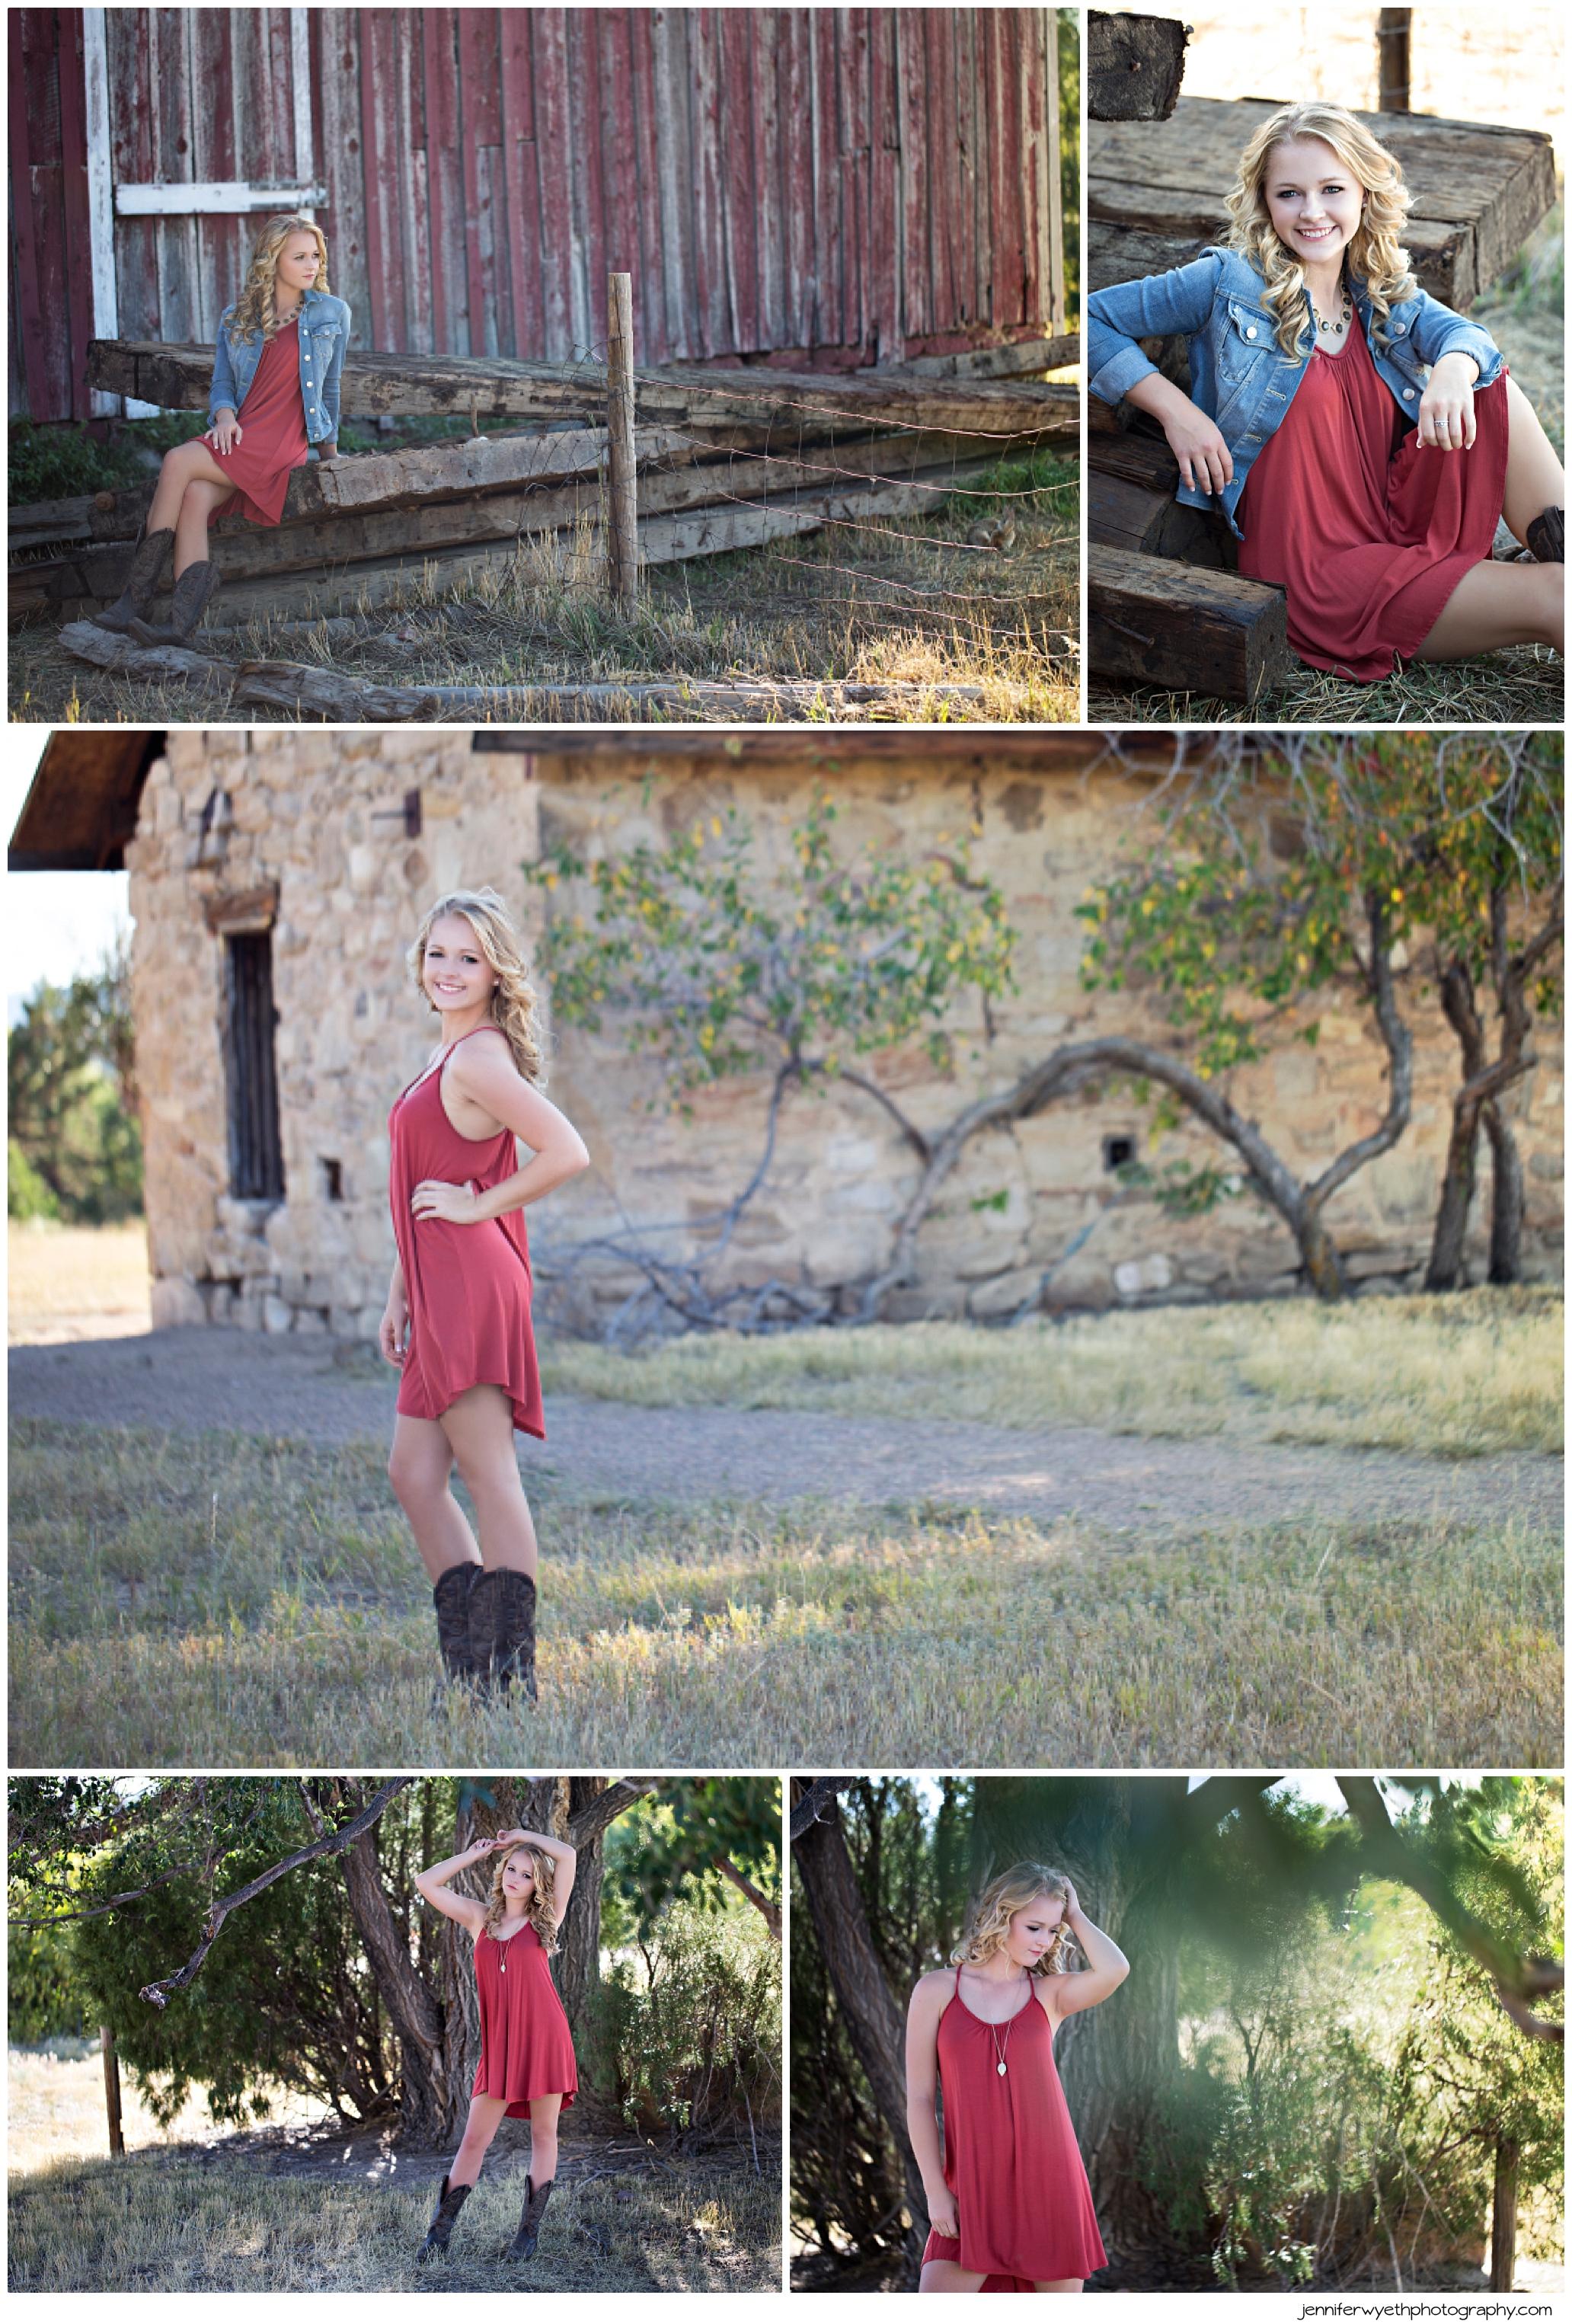 Jennifer-Wyeth-photography-senior-pictures-colorado-springs-photographer_0186.jpg